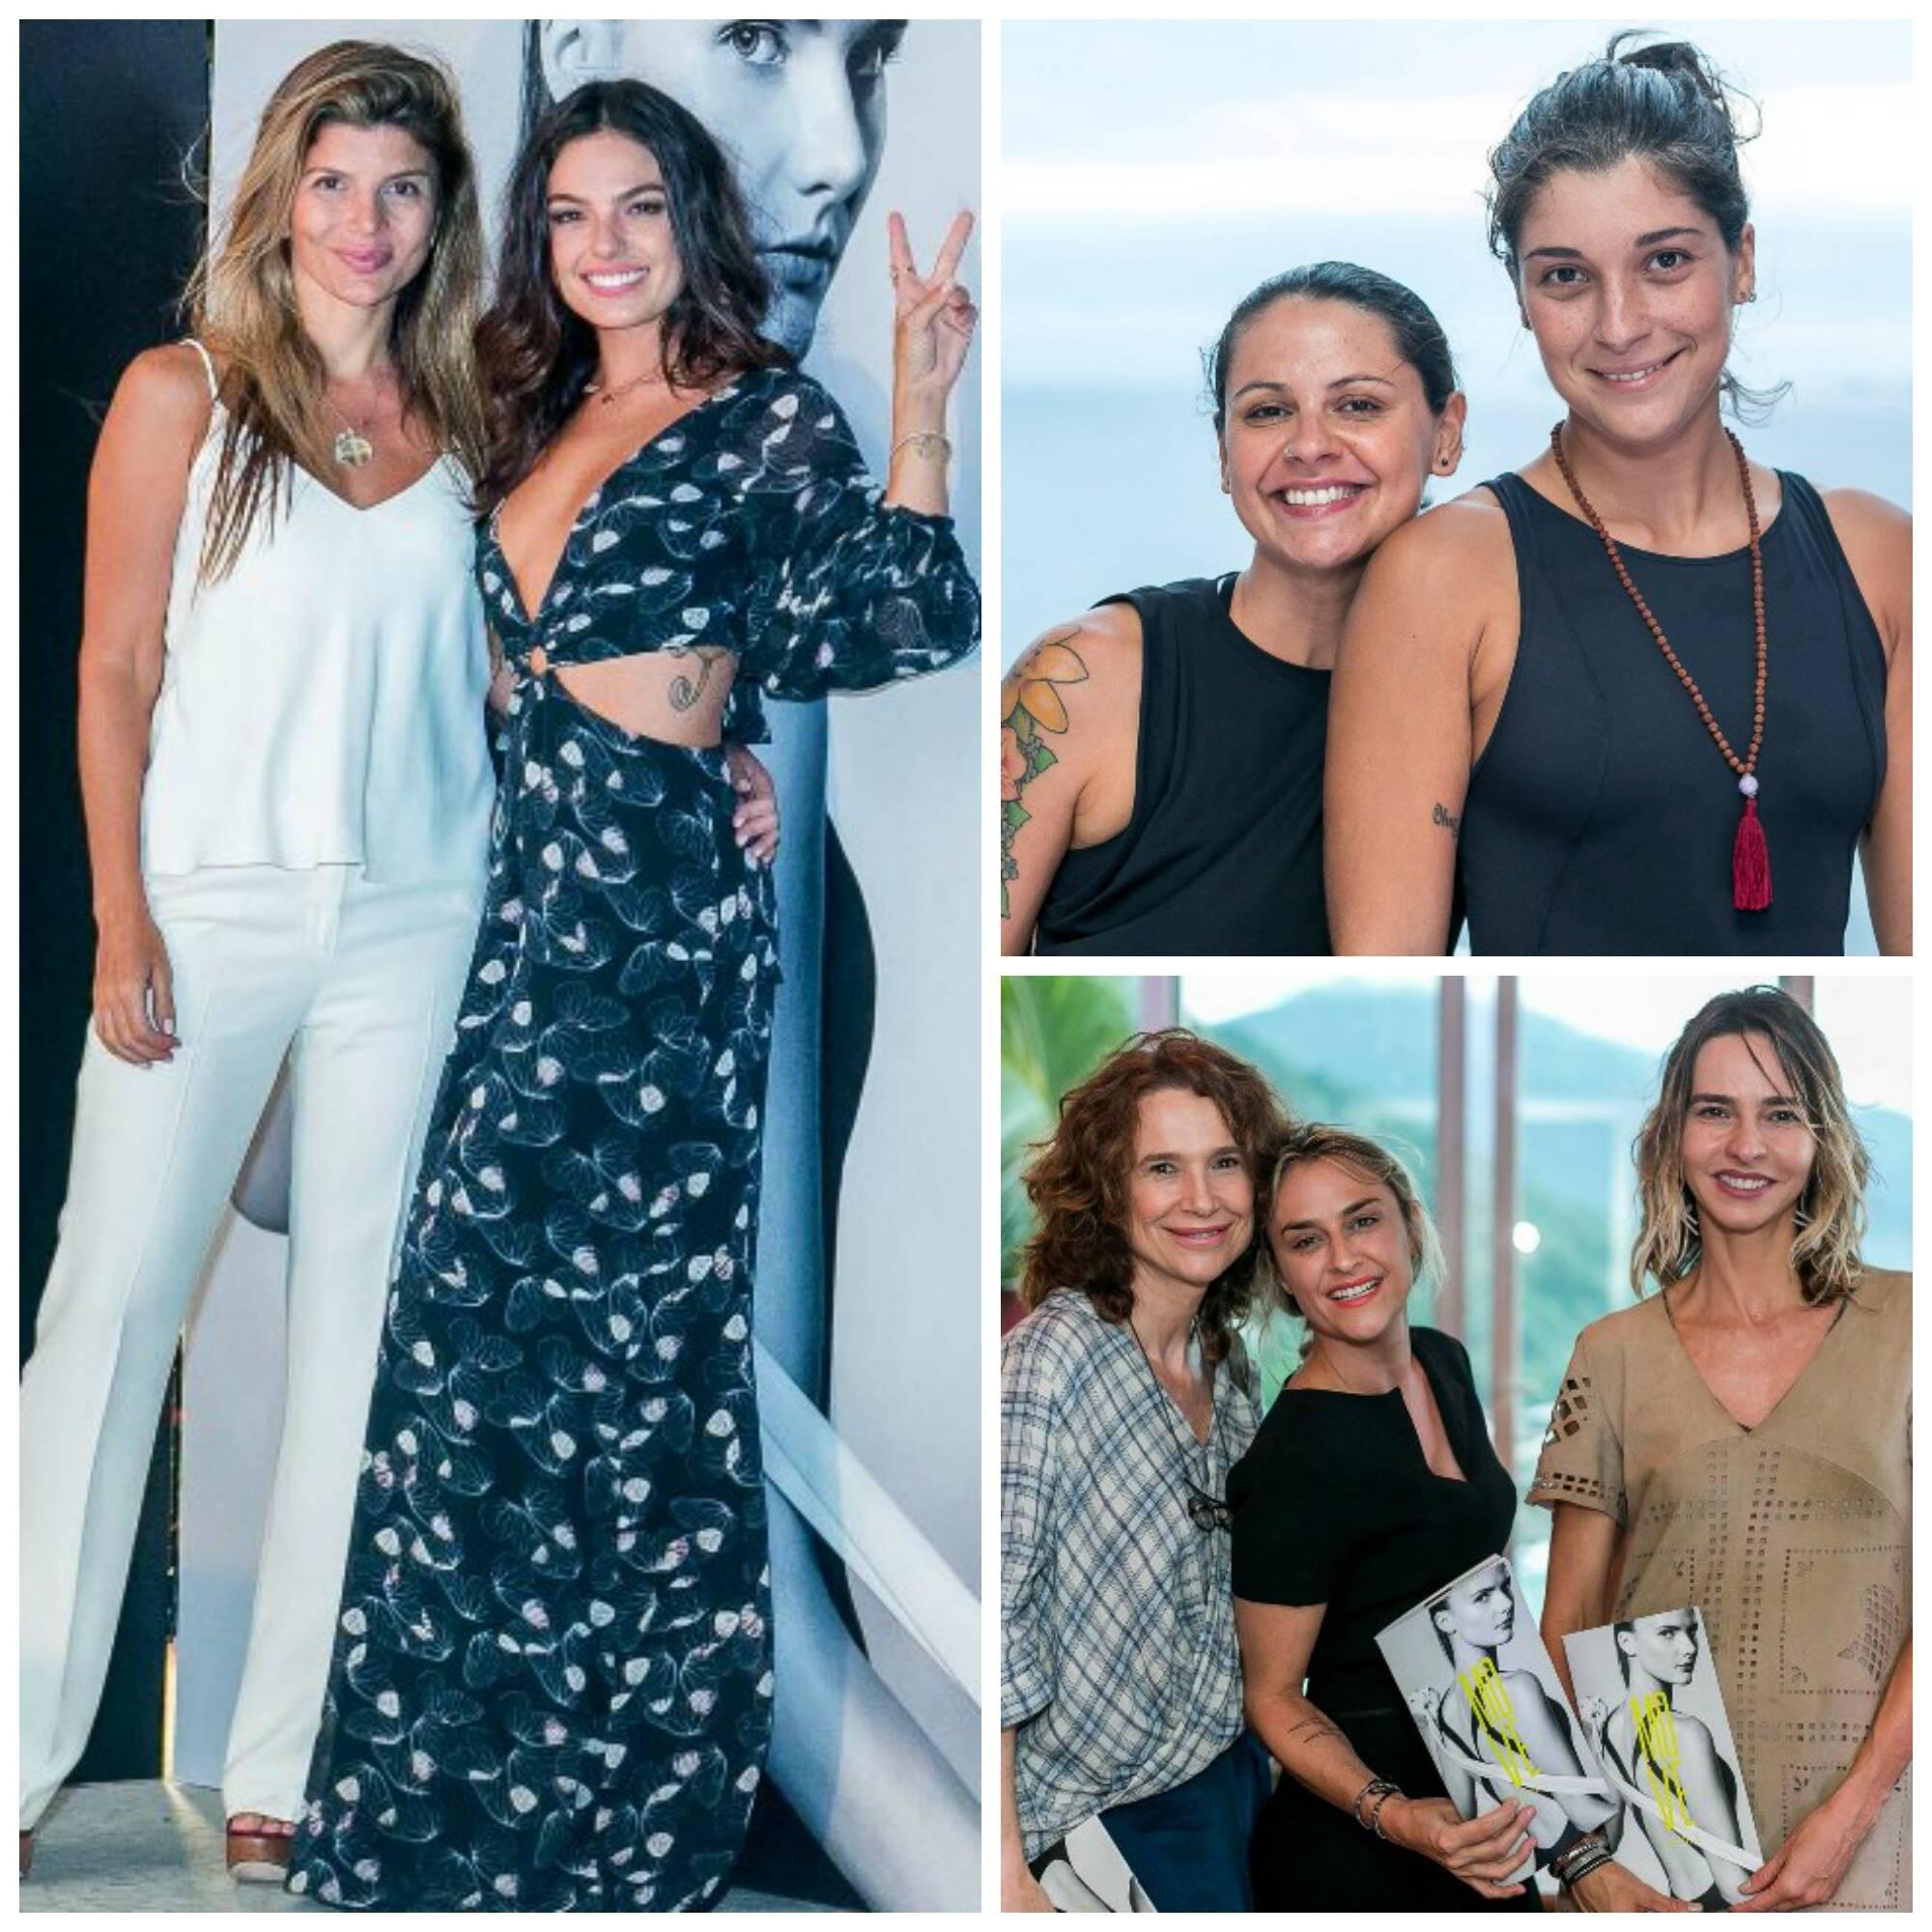 à esquerda, Claudia Jatahy e Isis Valverde; à direita Sa Souza e Ju Dominguez; Jackie Sperandio, Kiara Bianca e Zaza Piereck